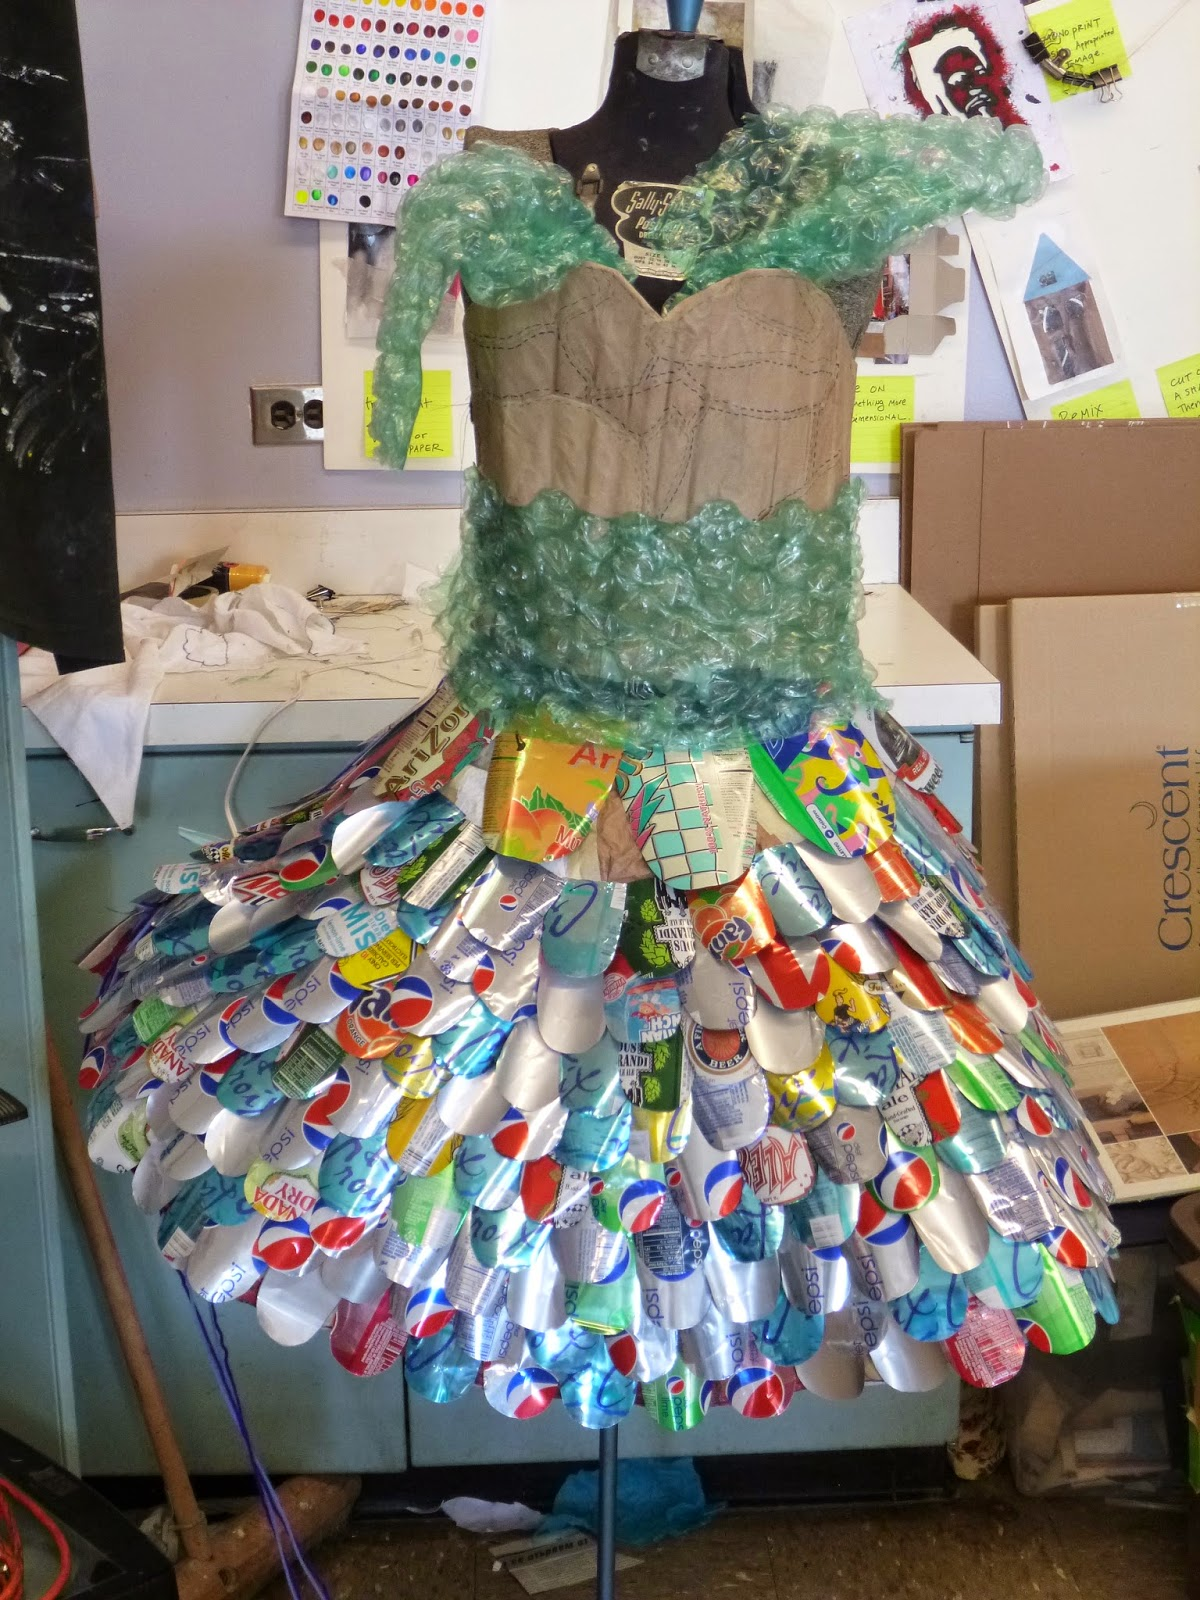 Recyclable Fashion: Lane Tech Art Studio : Recycled Fashion 2014